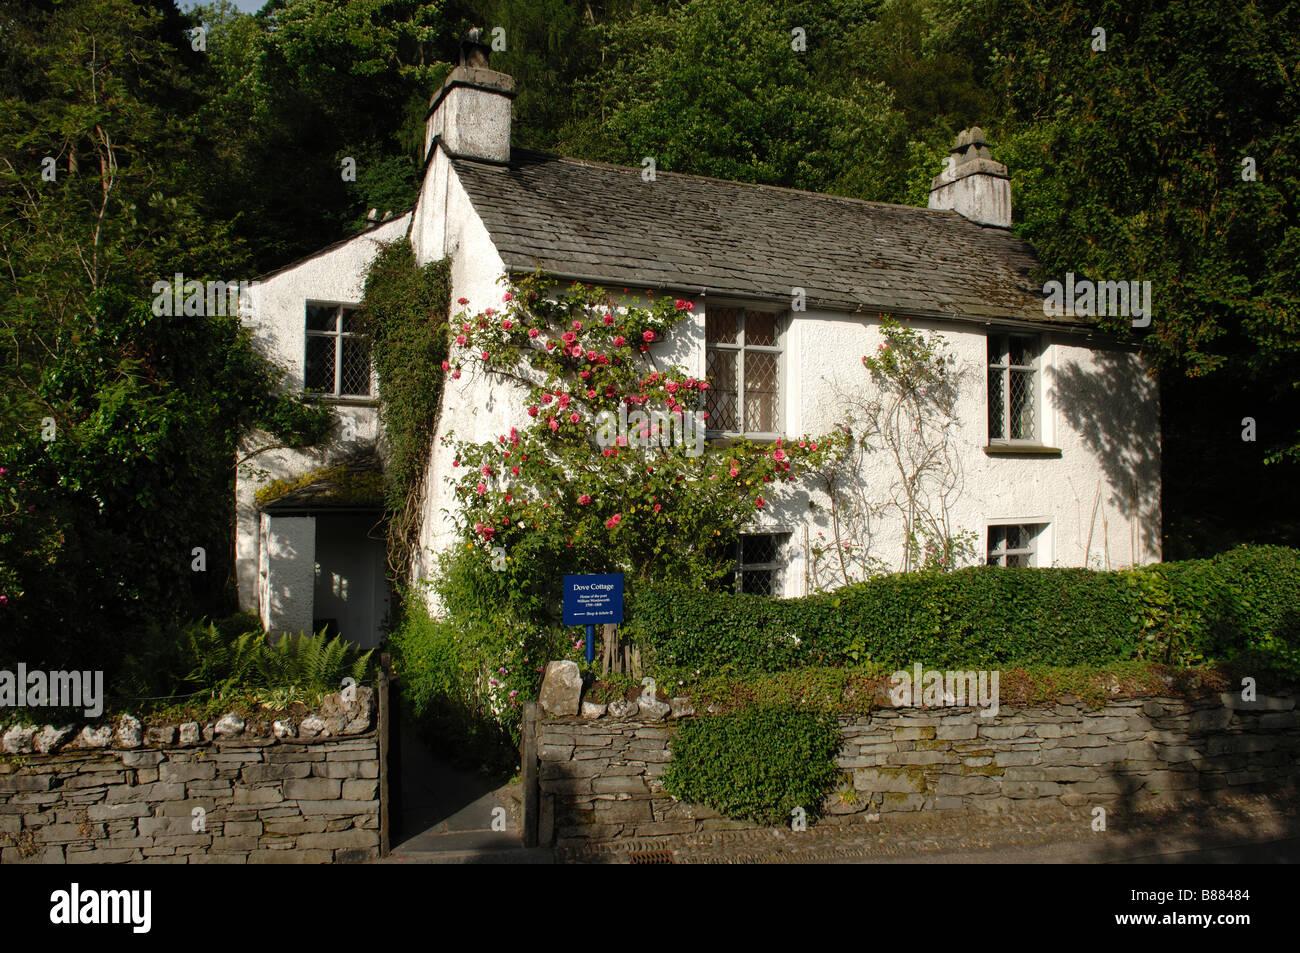 dove cottage grasmere former home of poet william wordsworth english rh alamy com dove cottage grasmere cumbria dove cottage grasmere entry fee